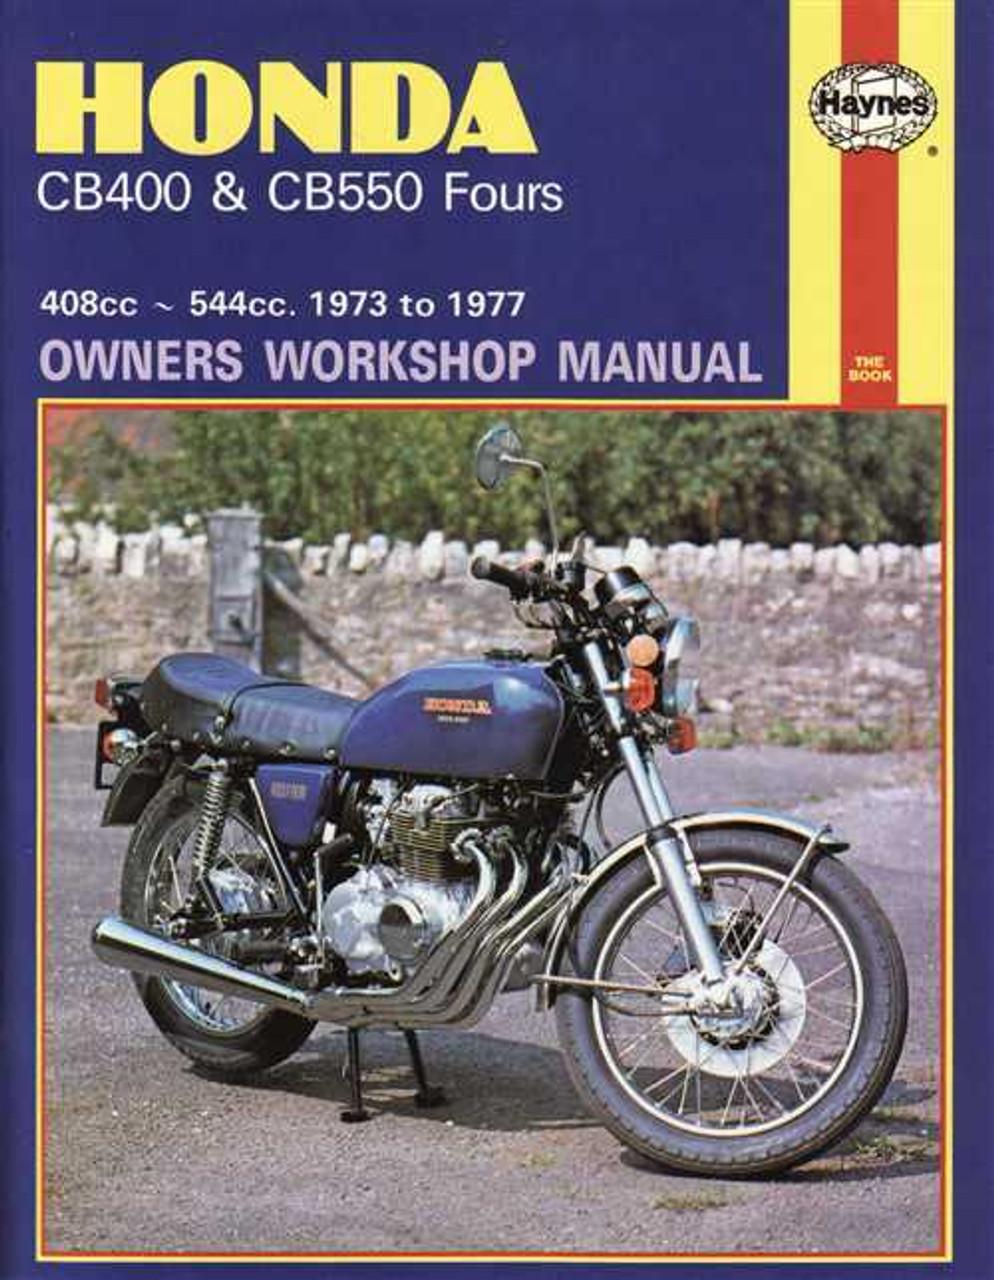 honda cb400 amp cb550 fours 408cc amp 544cc 1973 1977 workshop rh automotobookshop com au 1979 Honda CB400 2017 Honda CB400